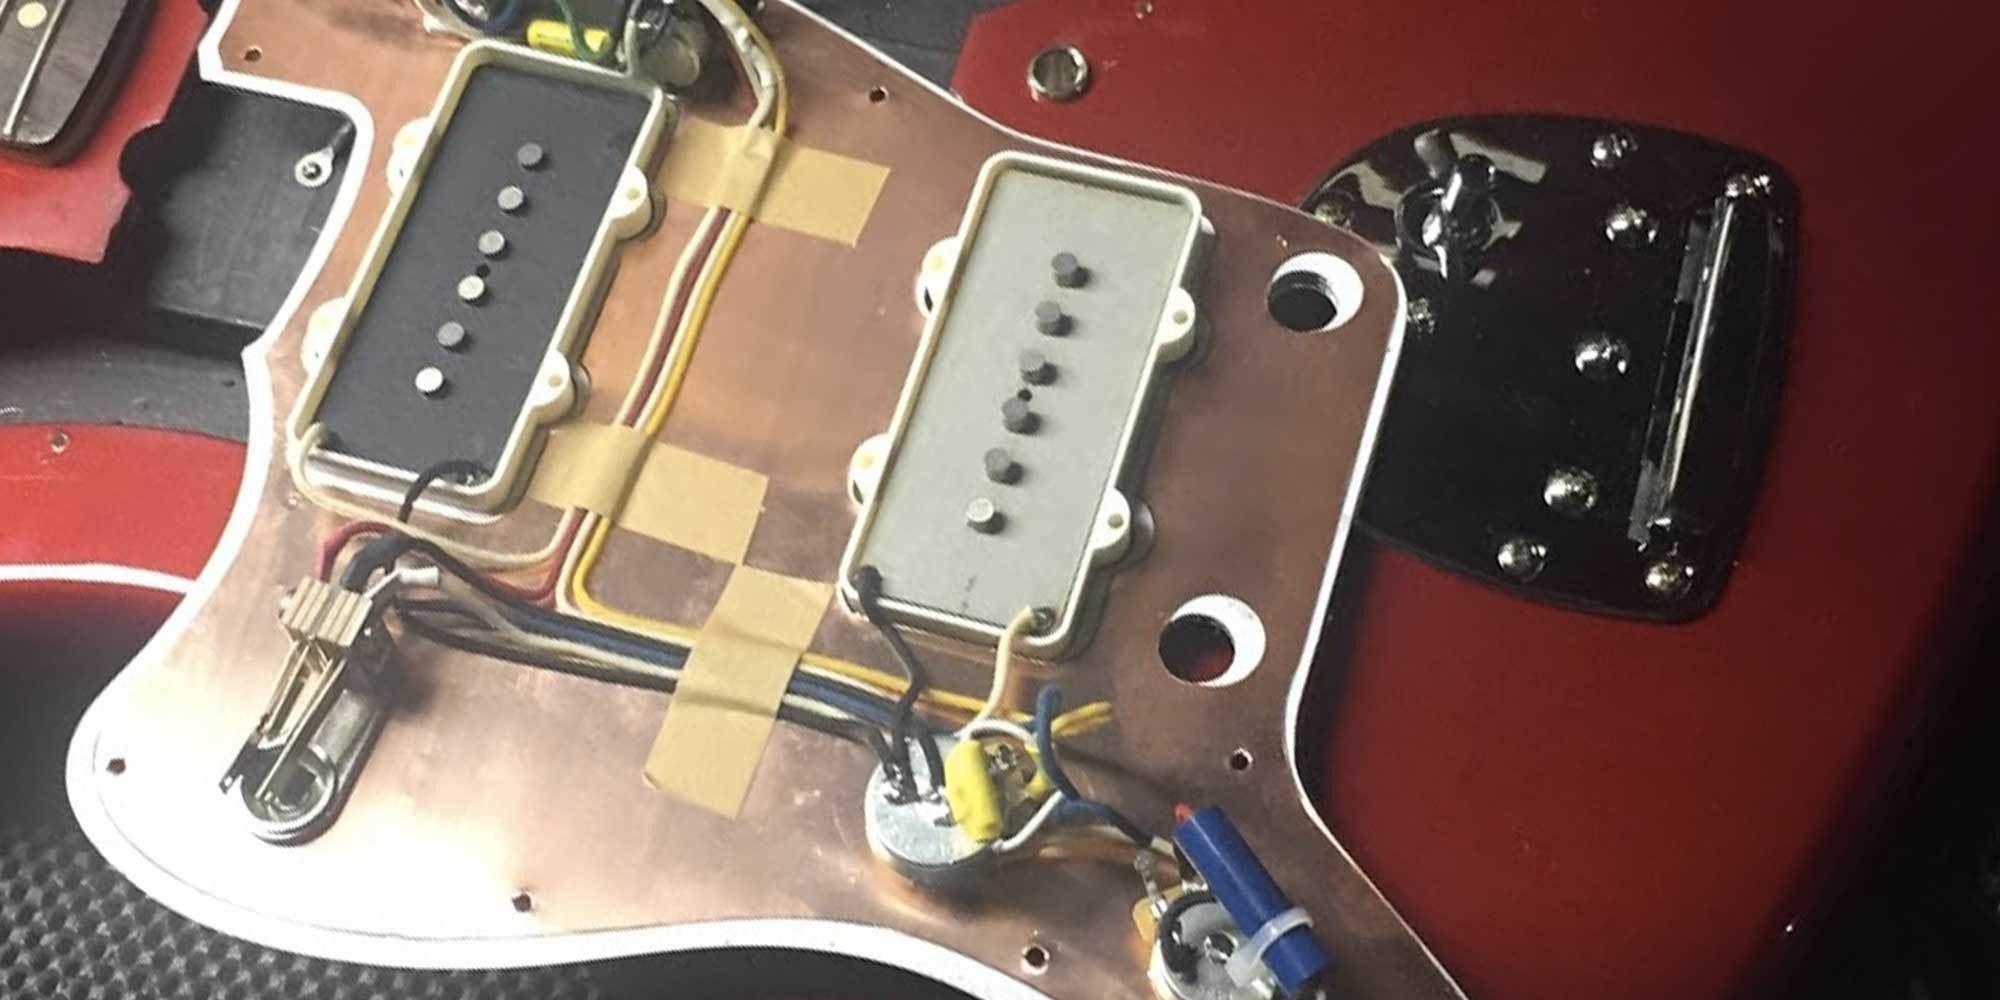 [DIAGRAM_3US]  Unique Ovation Guitar Wiring Diagram #diagram #diagramsample  #diagramtemplate #wiringdiagram #diagramchart #worksheet #wo… | Guitar, Electric  guitar, Ovation guitar | Ovation Electric Guitar Wiring Schematics |  | Pinterest